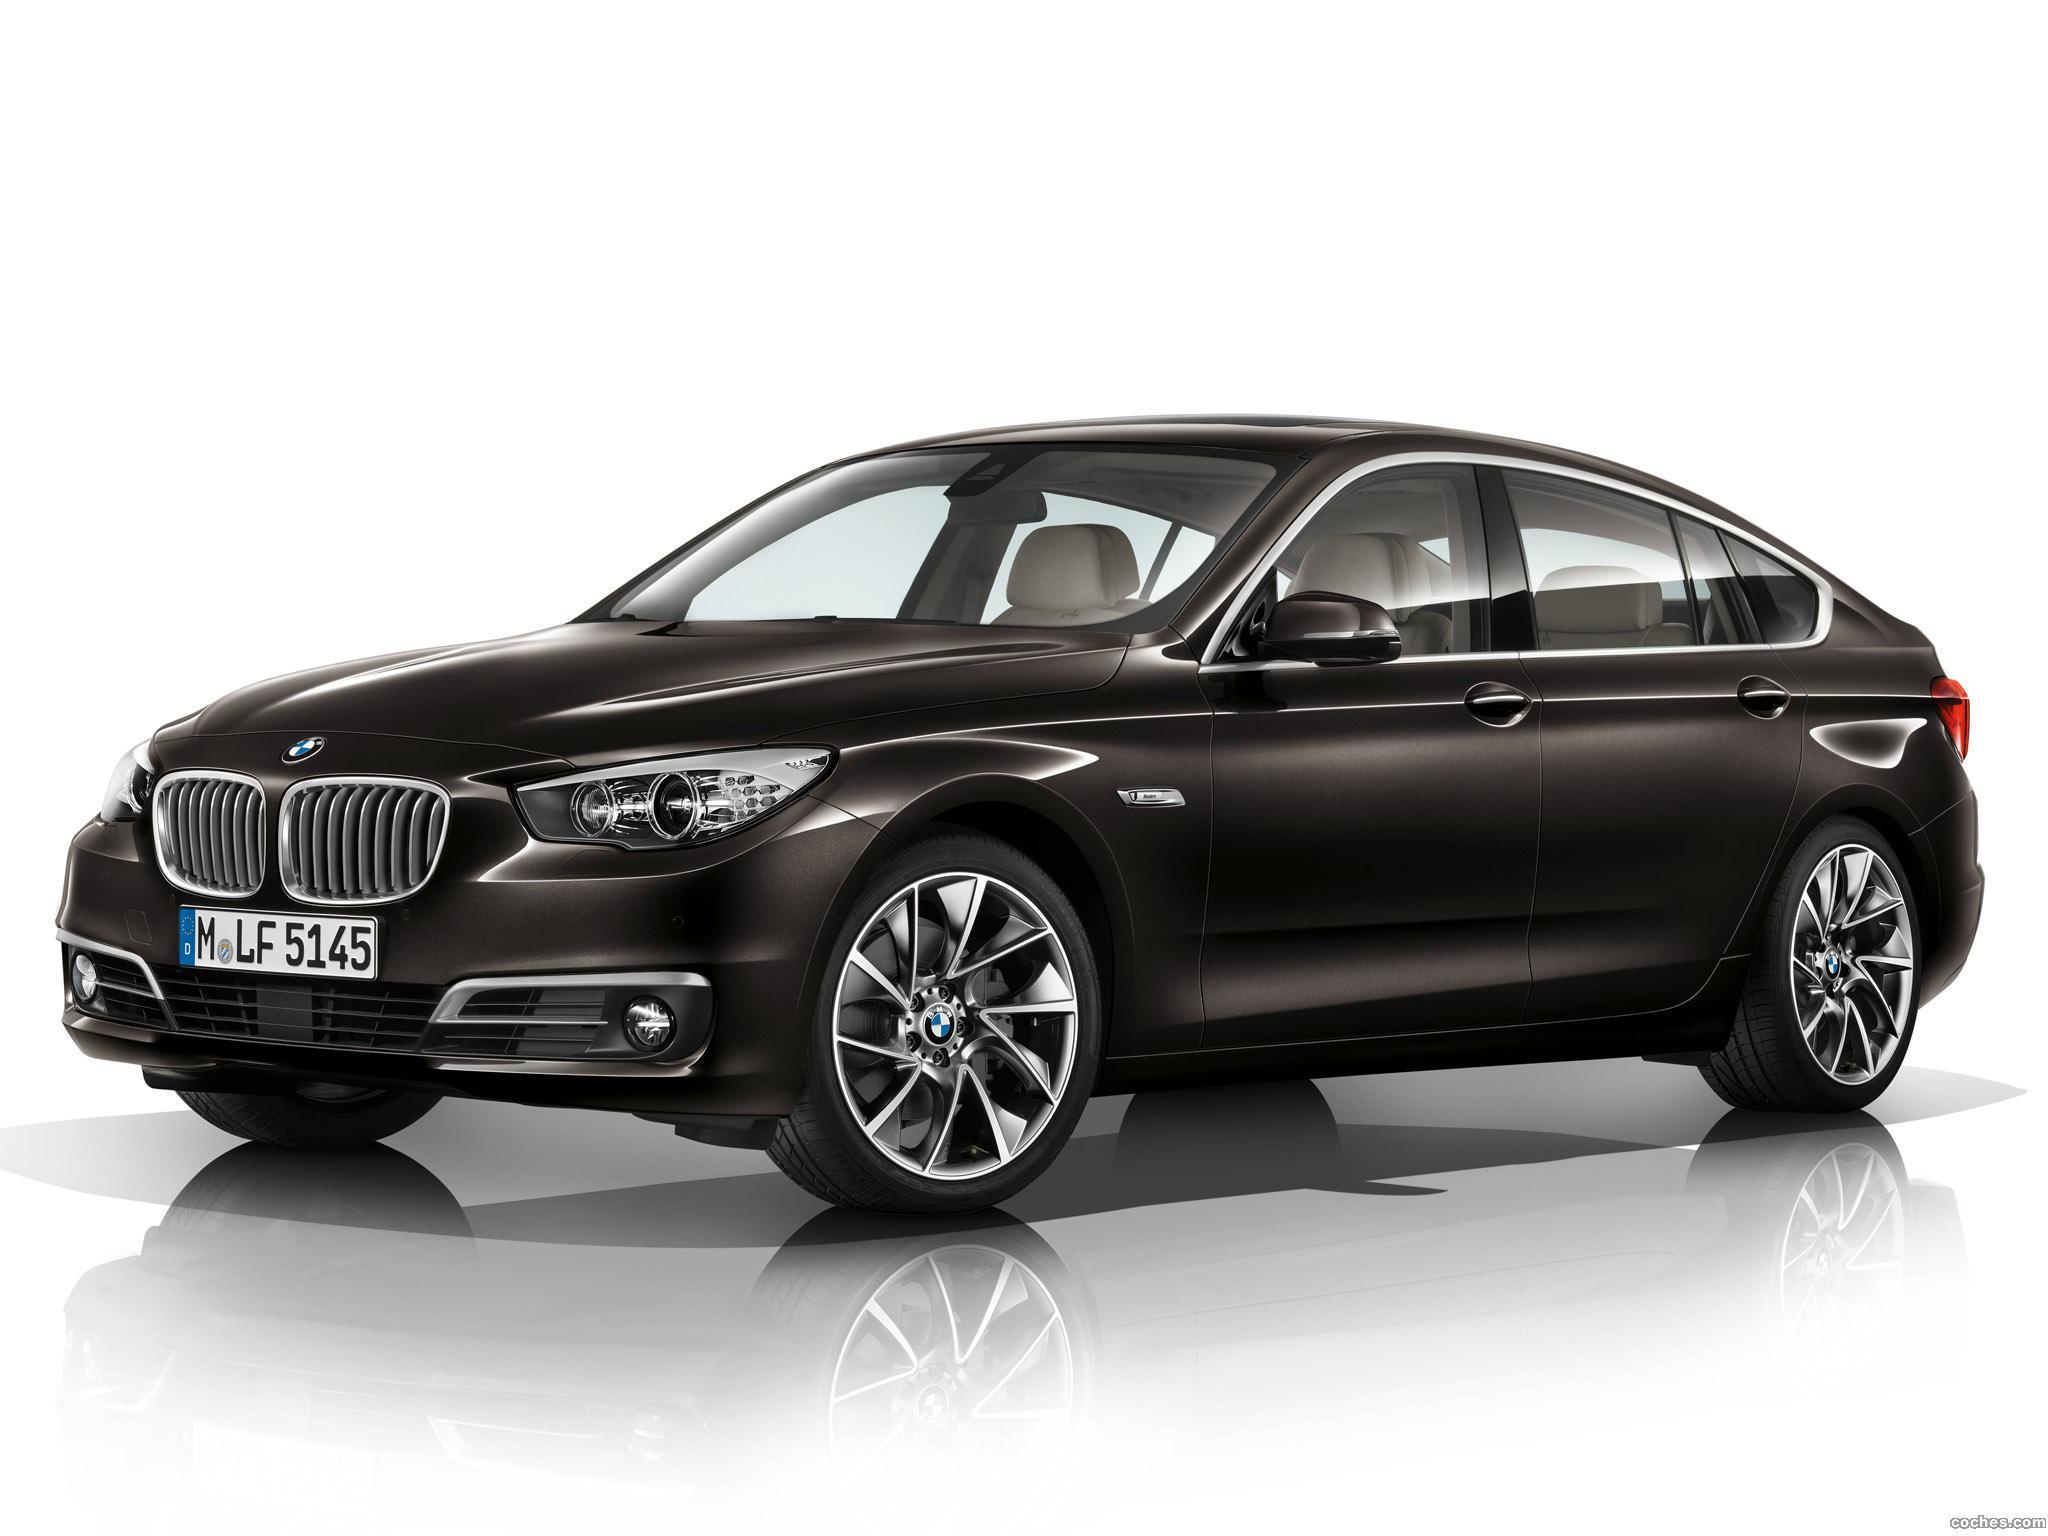 Foto 0 de BMW Serie 5 Gran Turismo Modern Line 2013